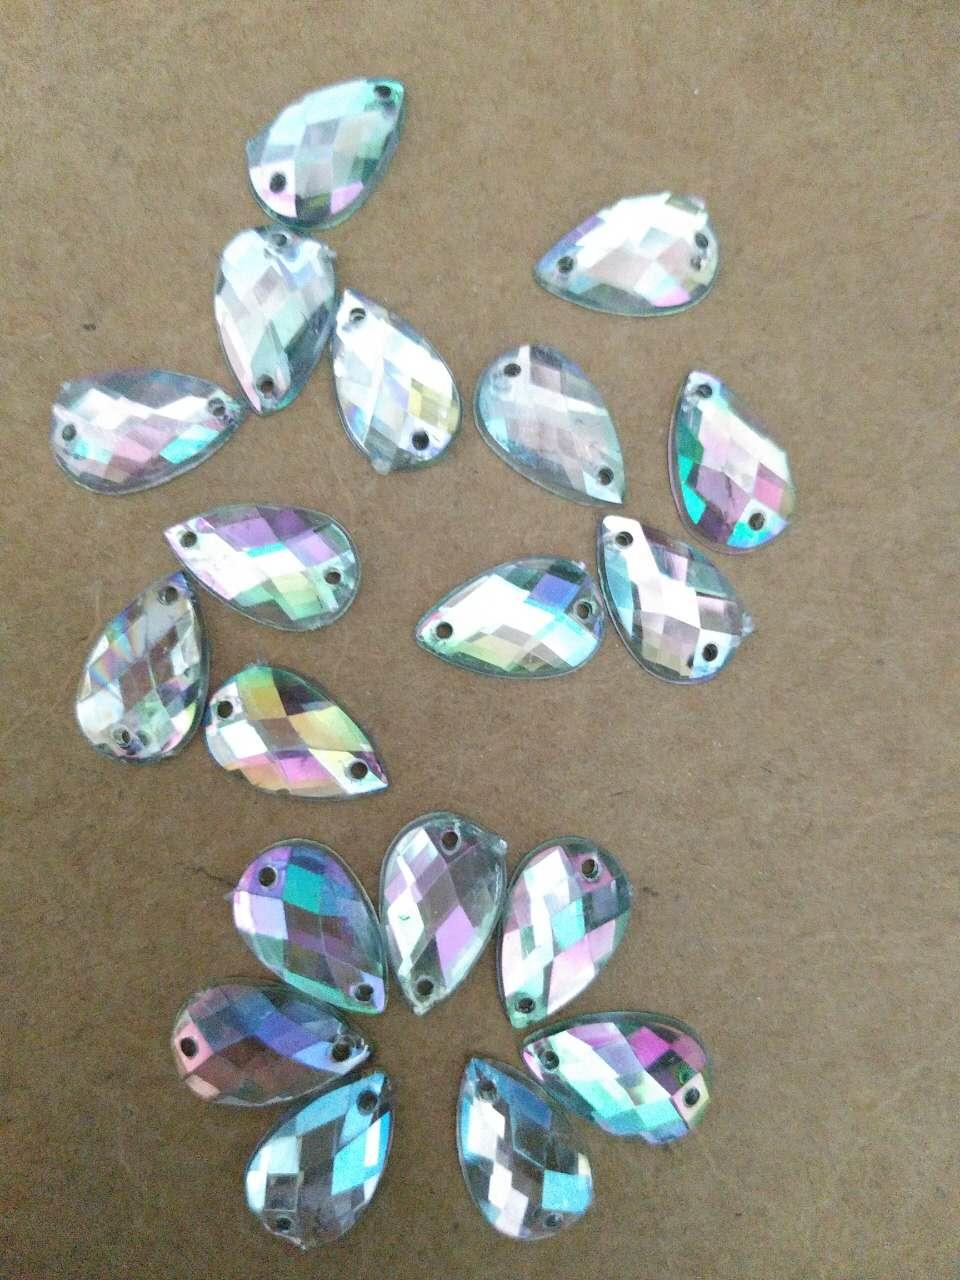 100pcs/lot Sew On Water Drop Shape Rhinestones Gems 8X13mm Clear AB Flatback Beads For Dress Shoe DIY Craft Accessary